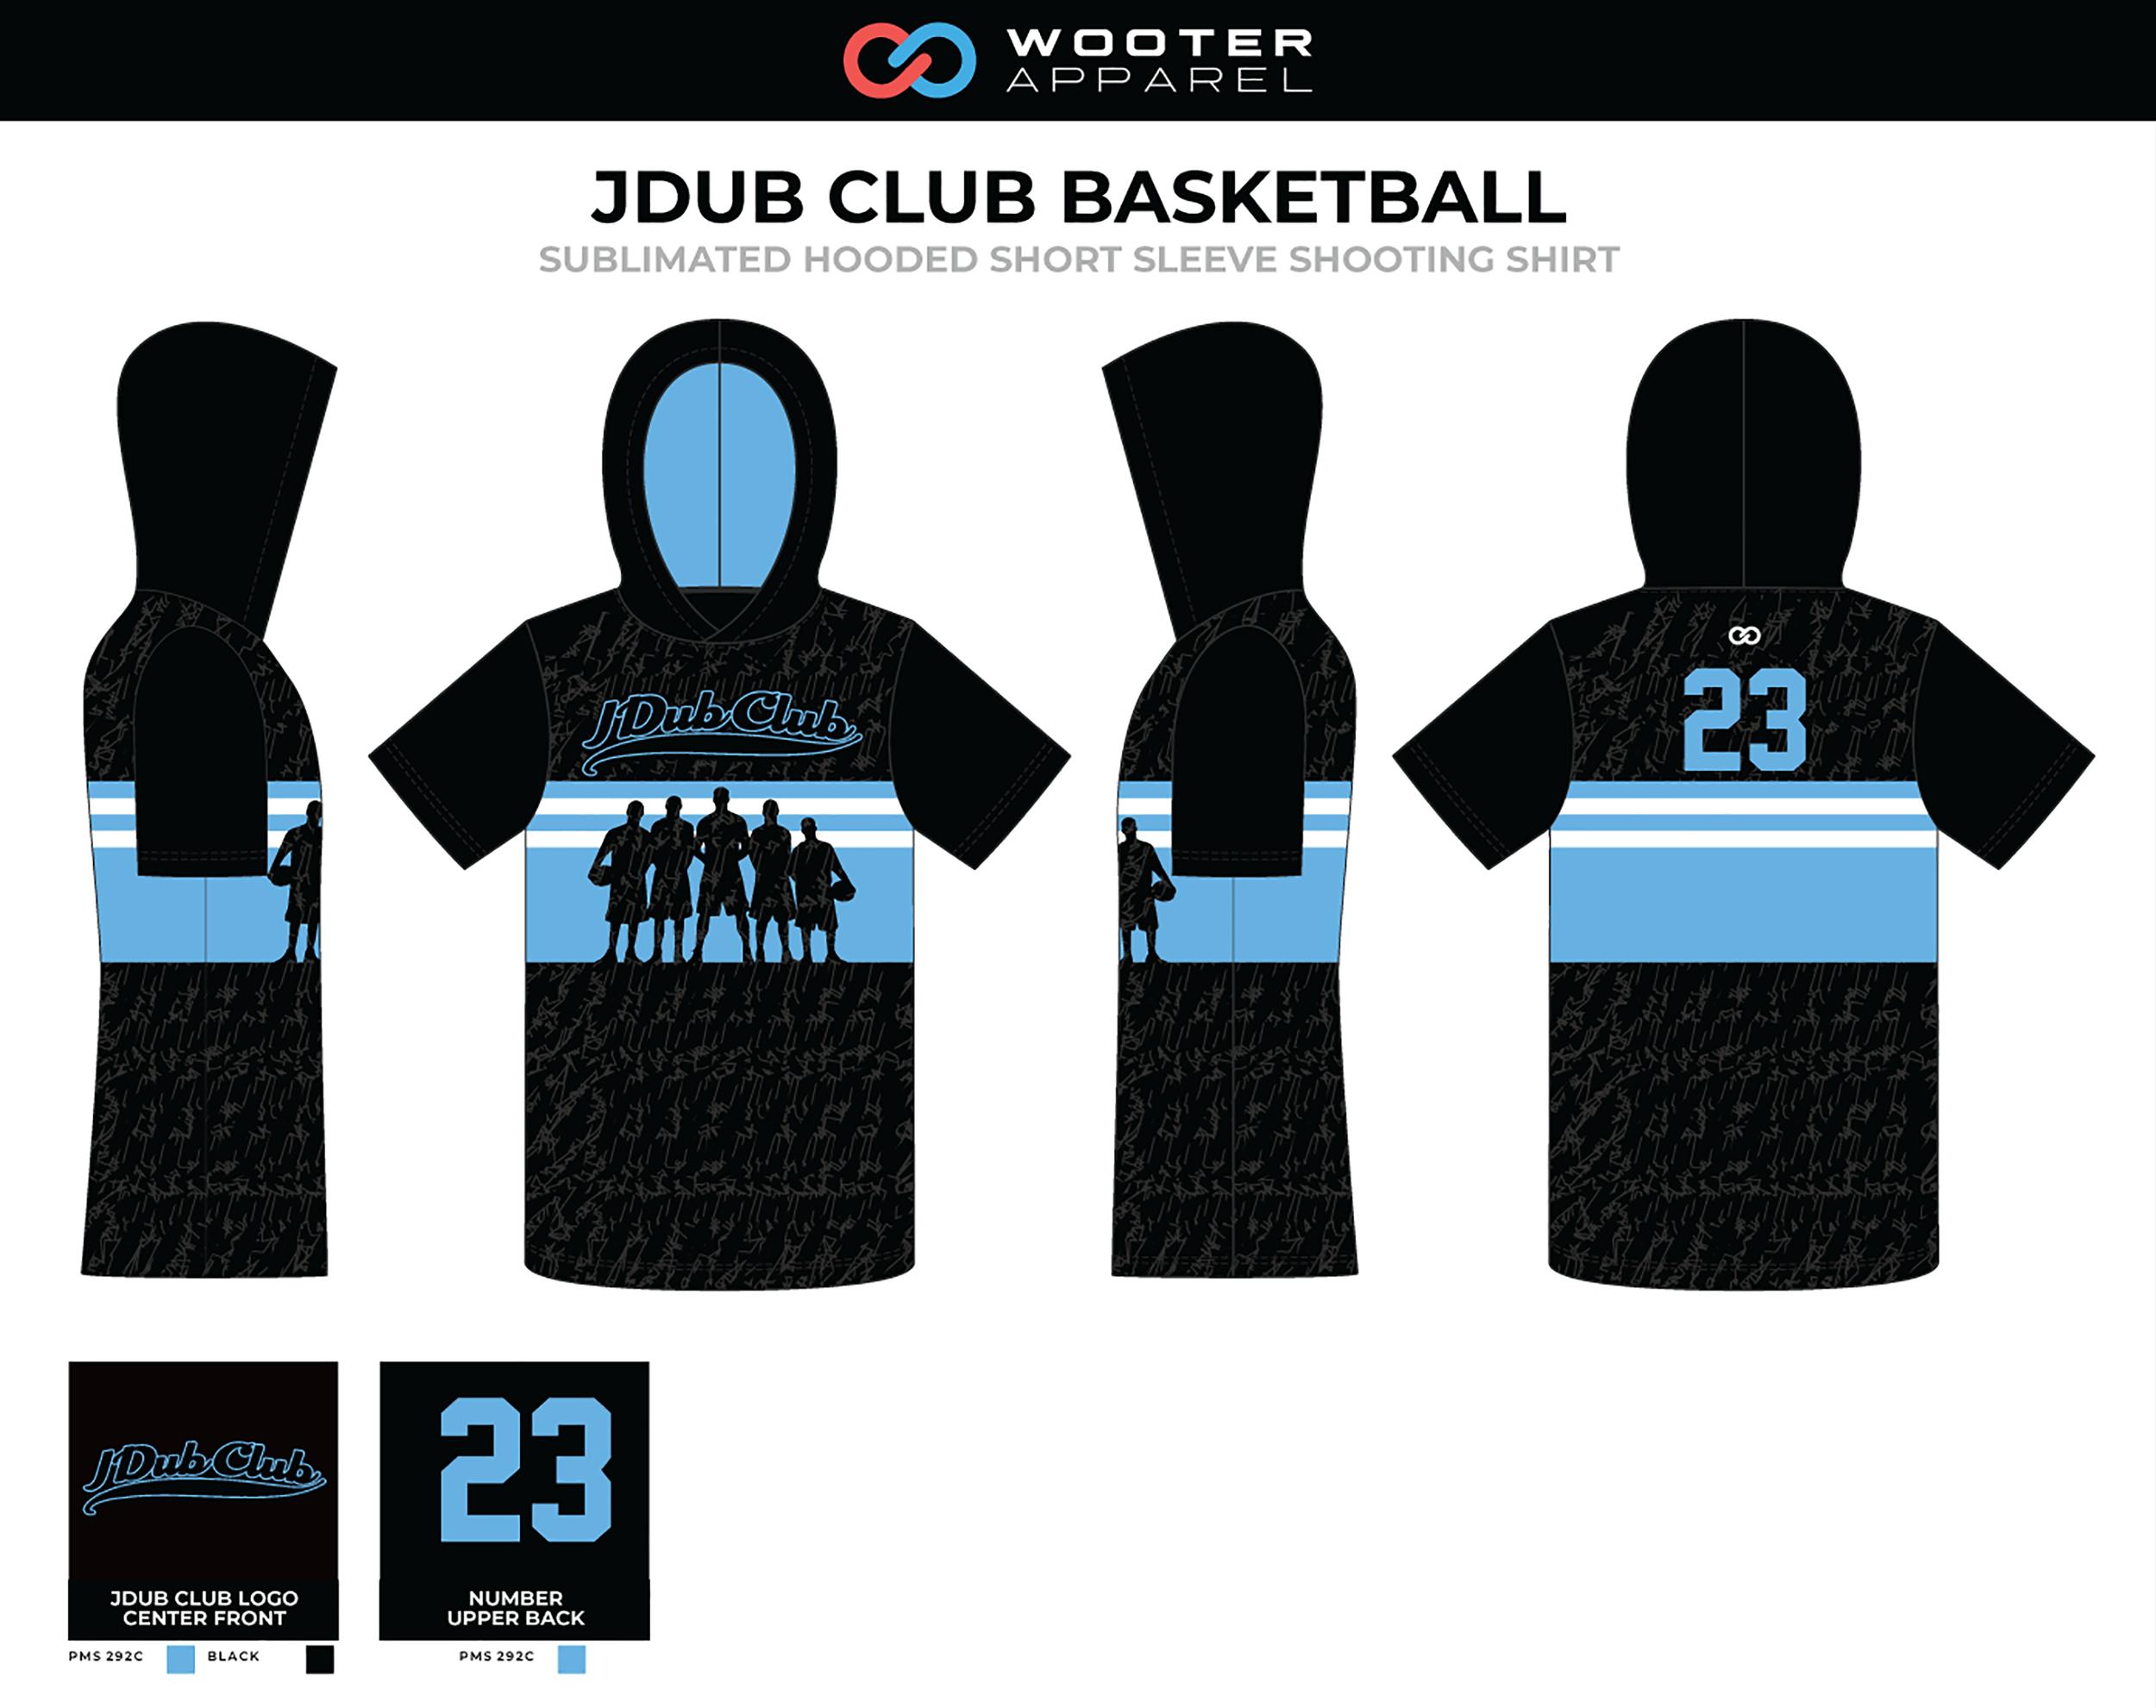 JDubClubBasketball_2019HoodedShootingShirtMockup.png